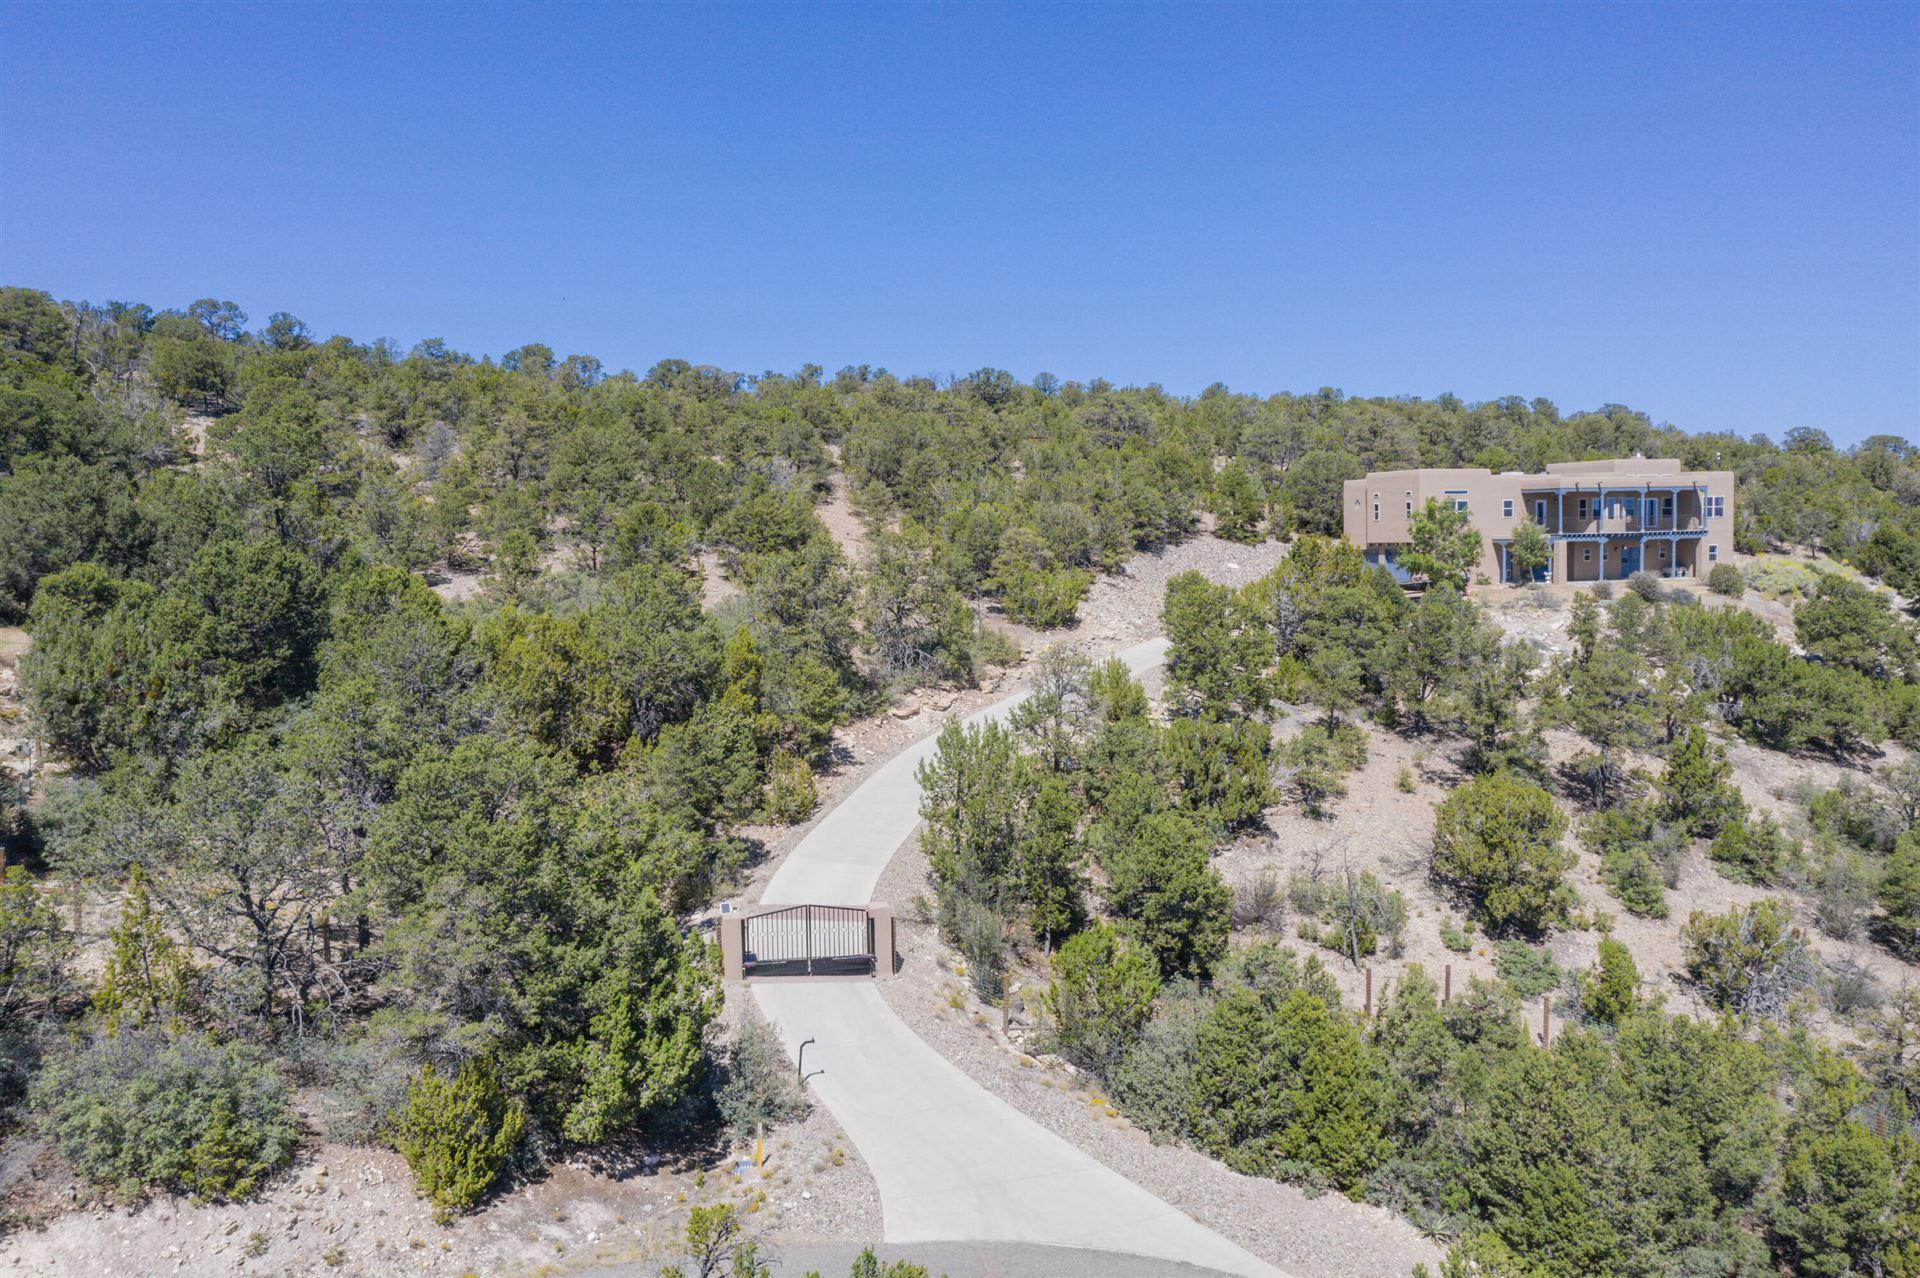 60 Sandia Mountain Ranch Drive, Tijeras, NM 87059 - #: 1001639